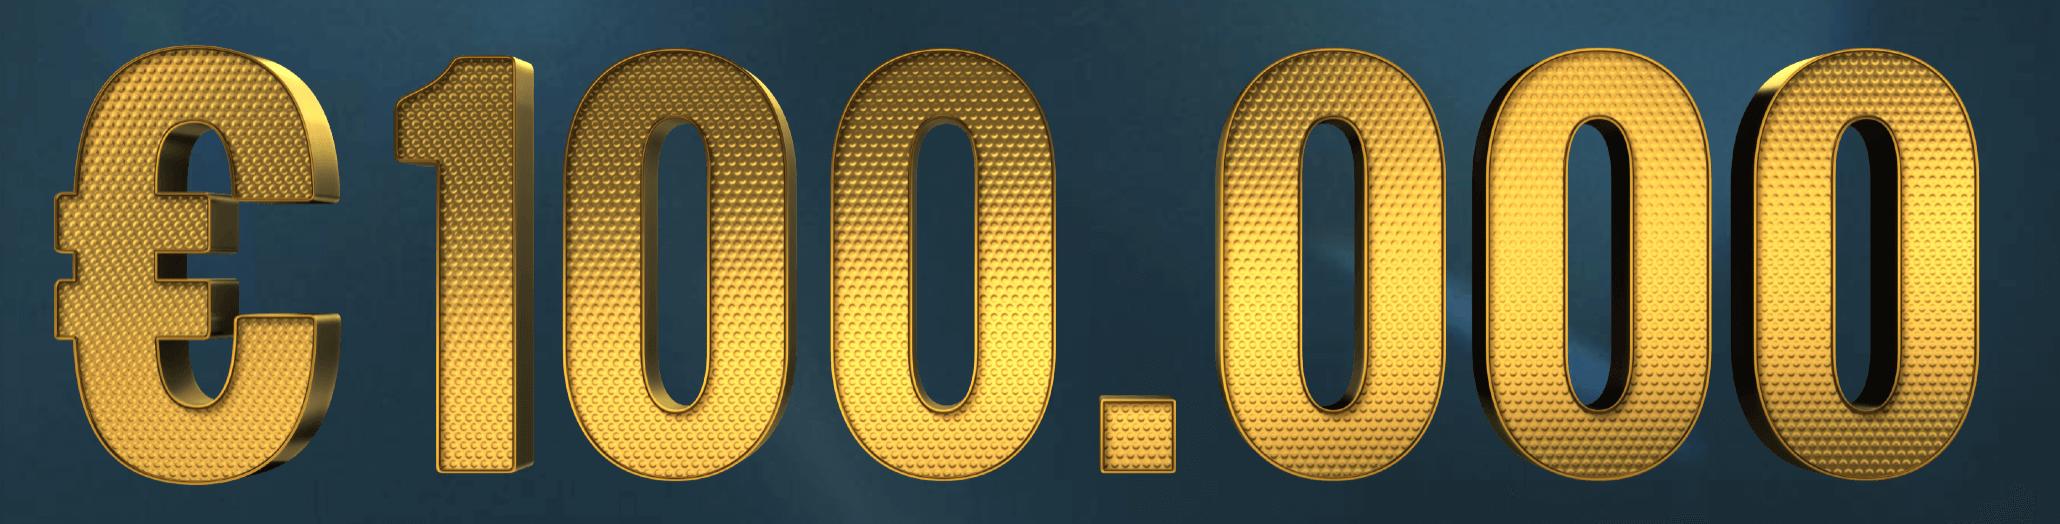 no accout casino 100000 1 - Nappaa osuutesi 100 000 eurosta!